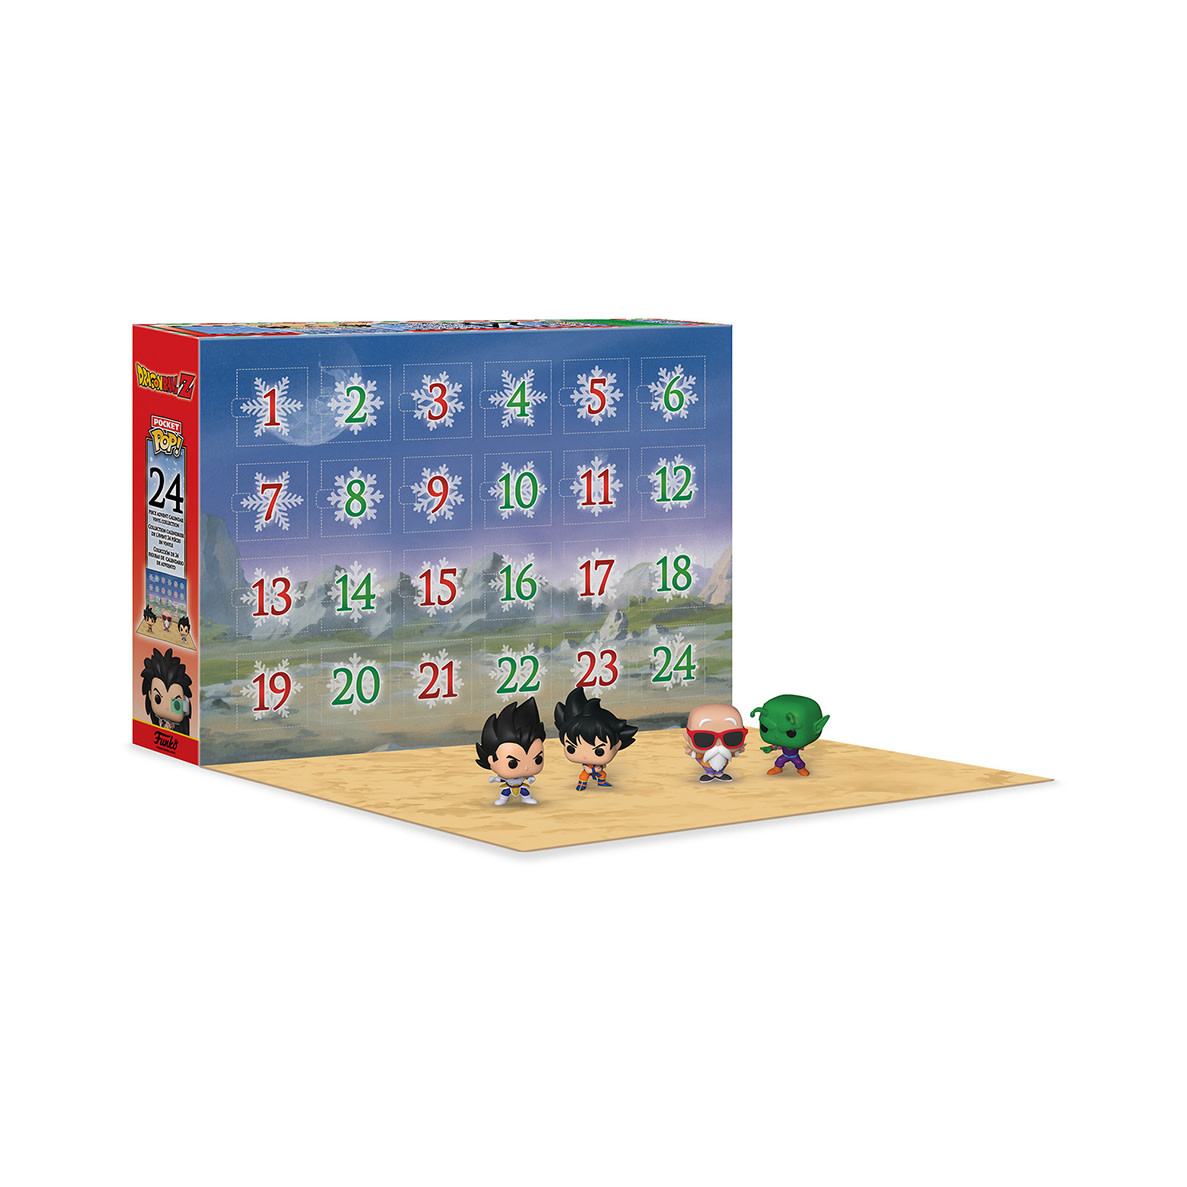 FUNKO Dragon Ball Z: Pocket Pop Advent Calendar